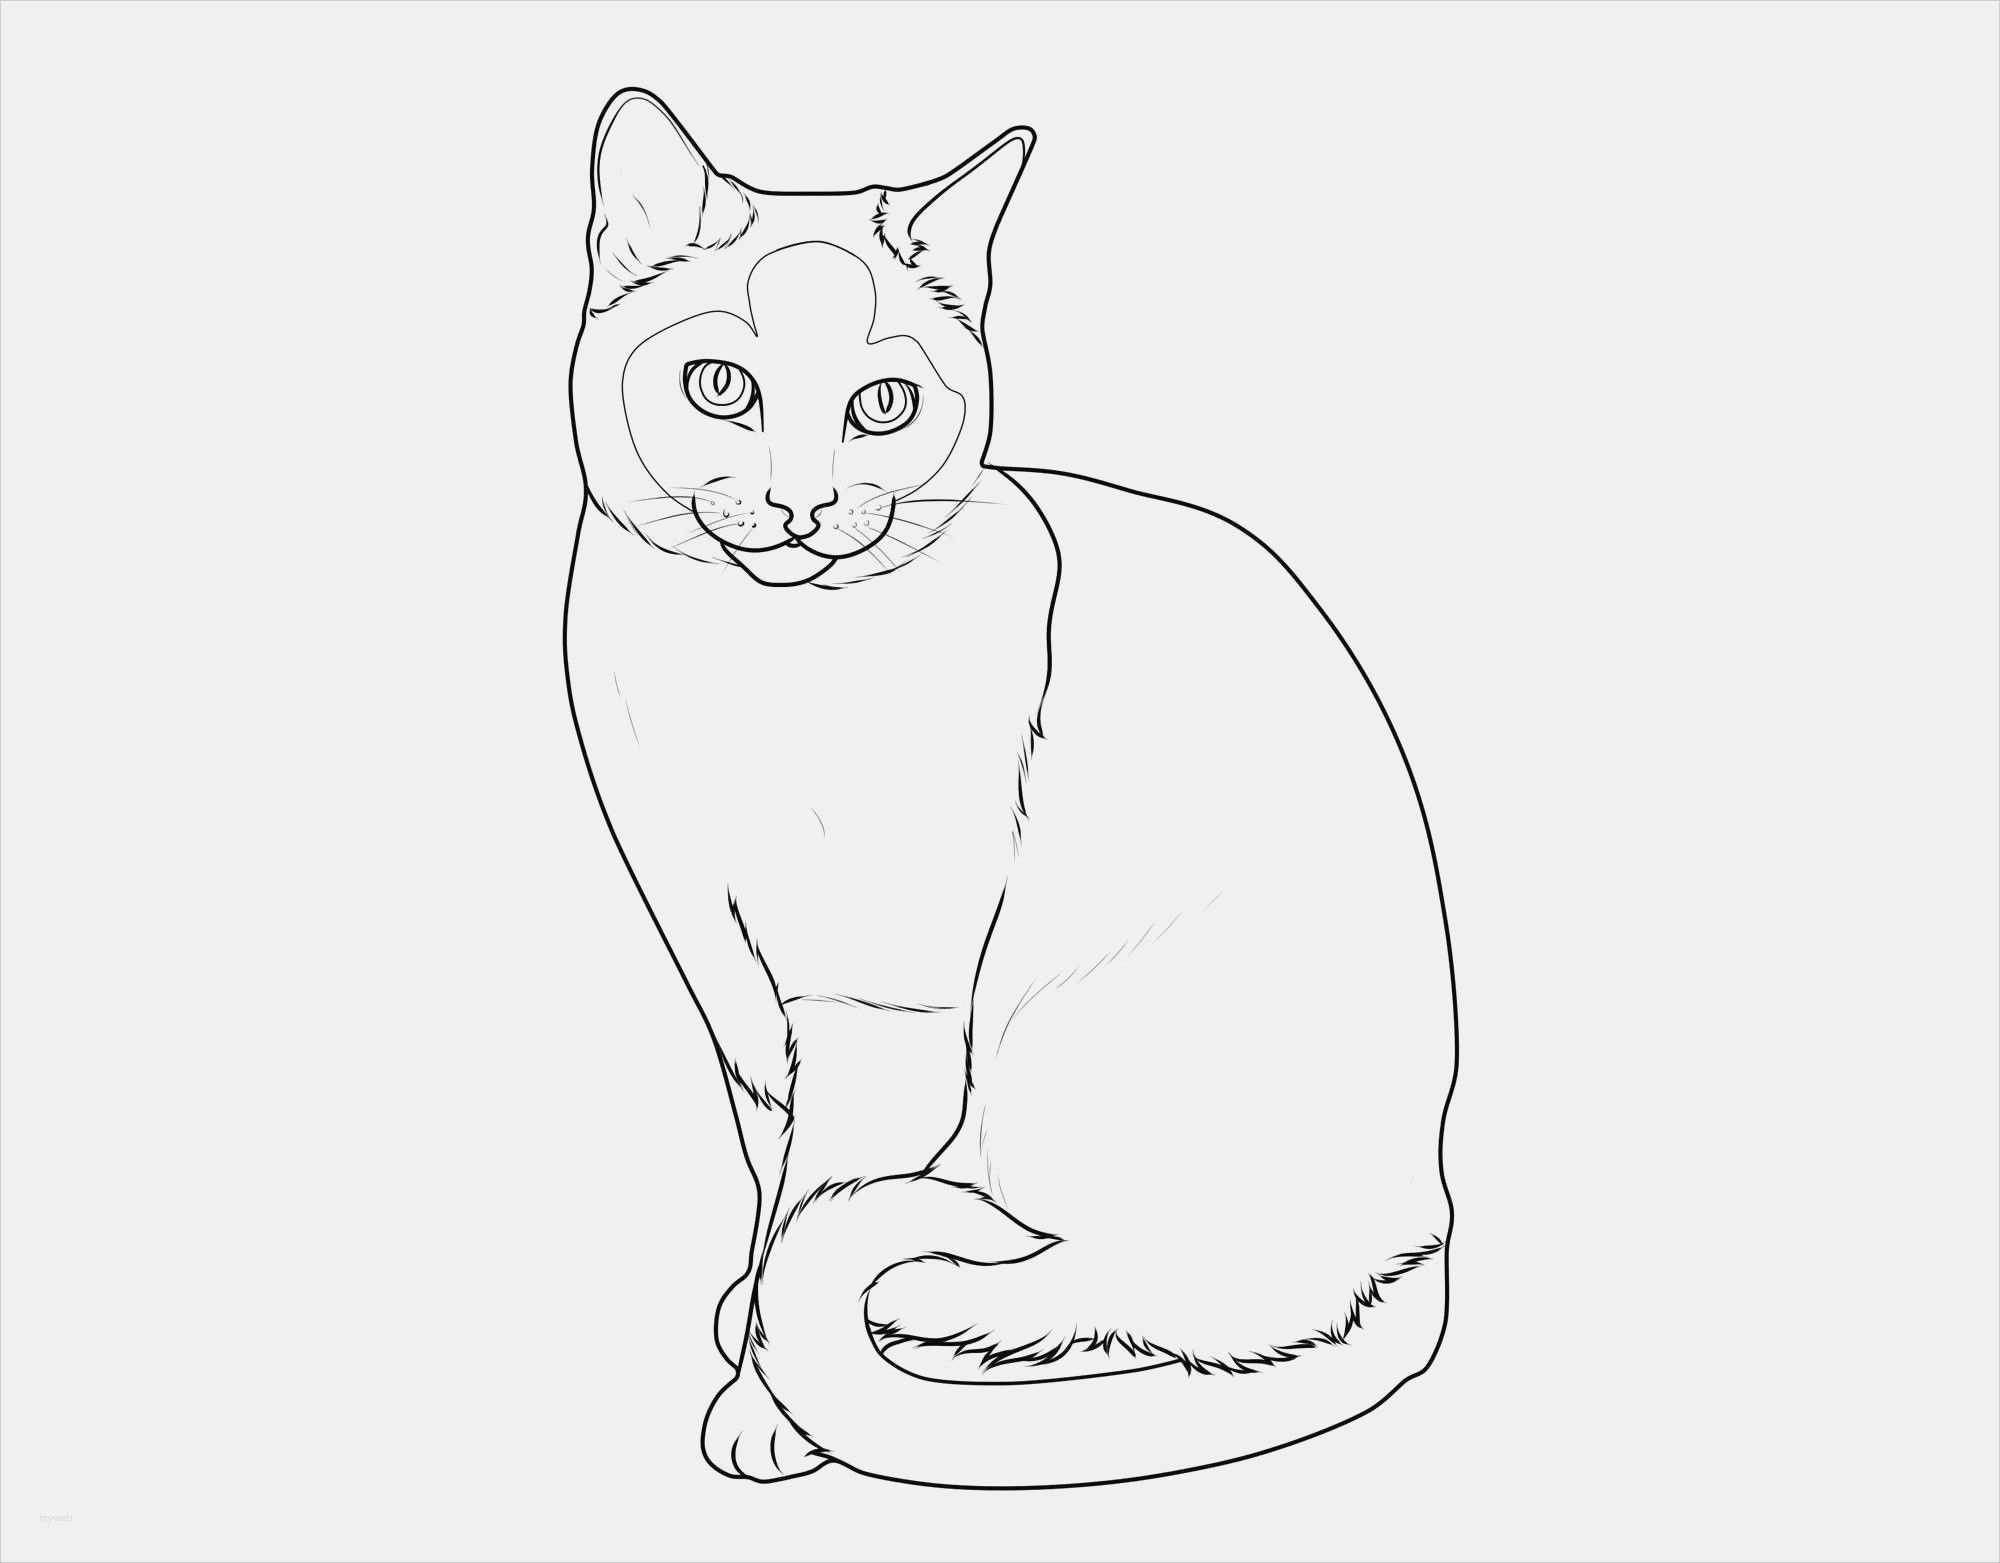 Neu Katzen Zum Malen Farbung Malvorlagen Malvorlagenfurkinder Katze Malen Malvorlagen Tiere Katzen